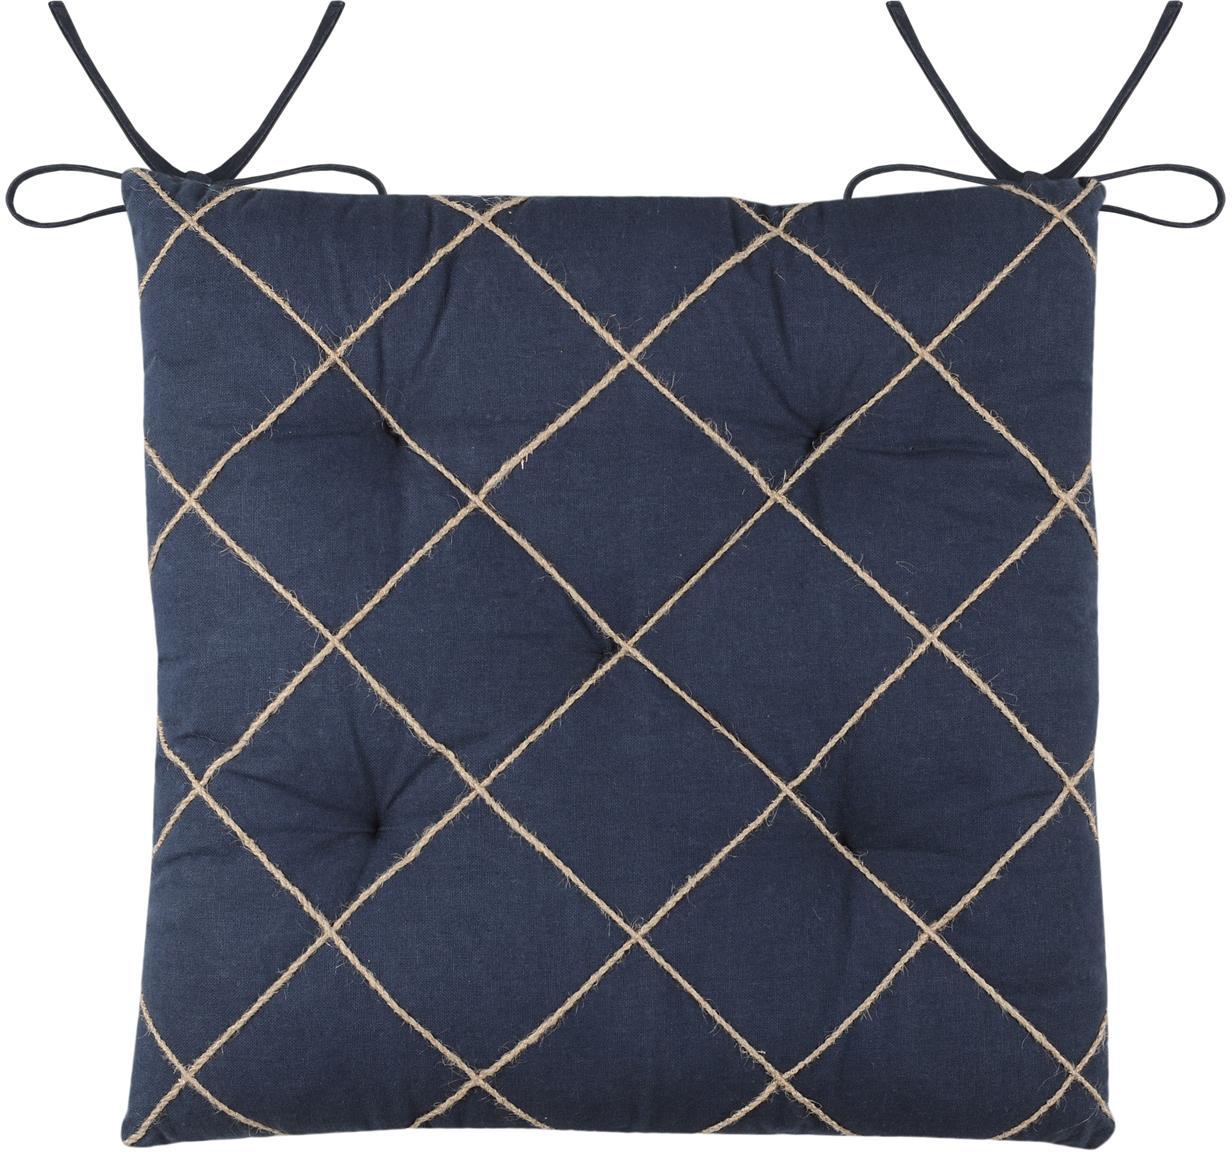 Stoelkussen Concarneau met verhoogd patroon, 100% katoen, Donkerblauw, 40 x 40 cm